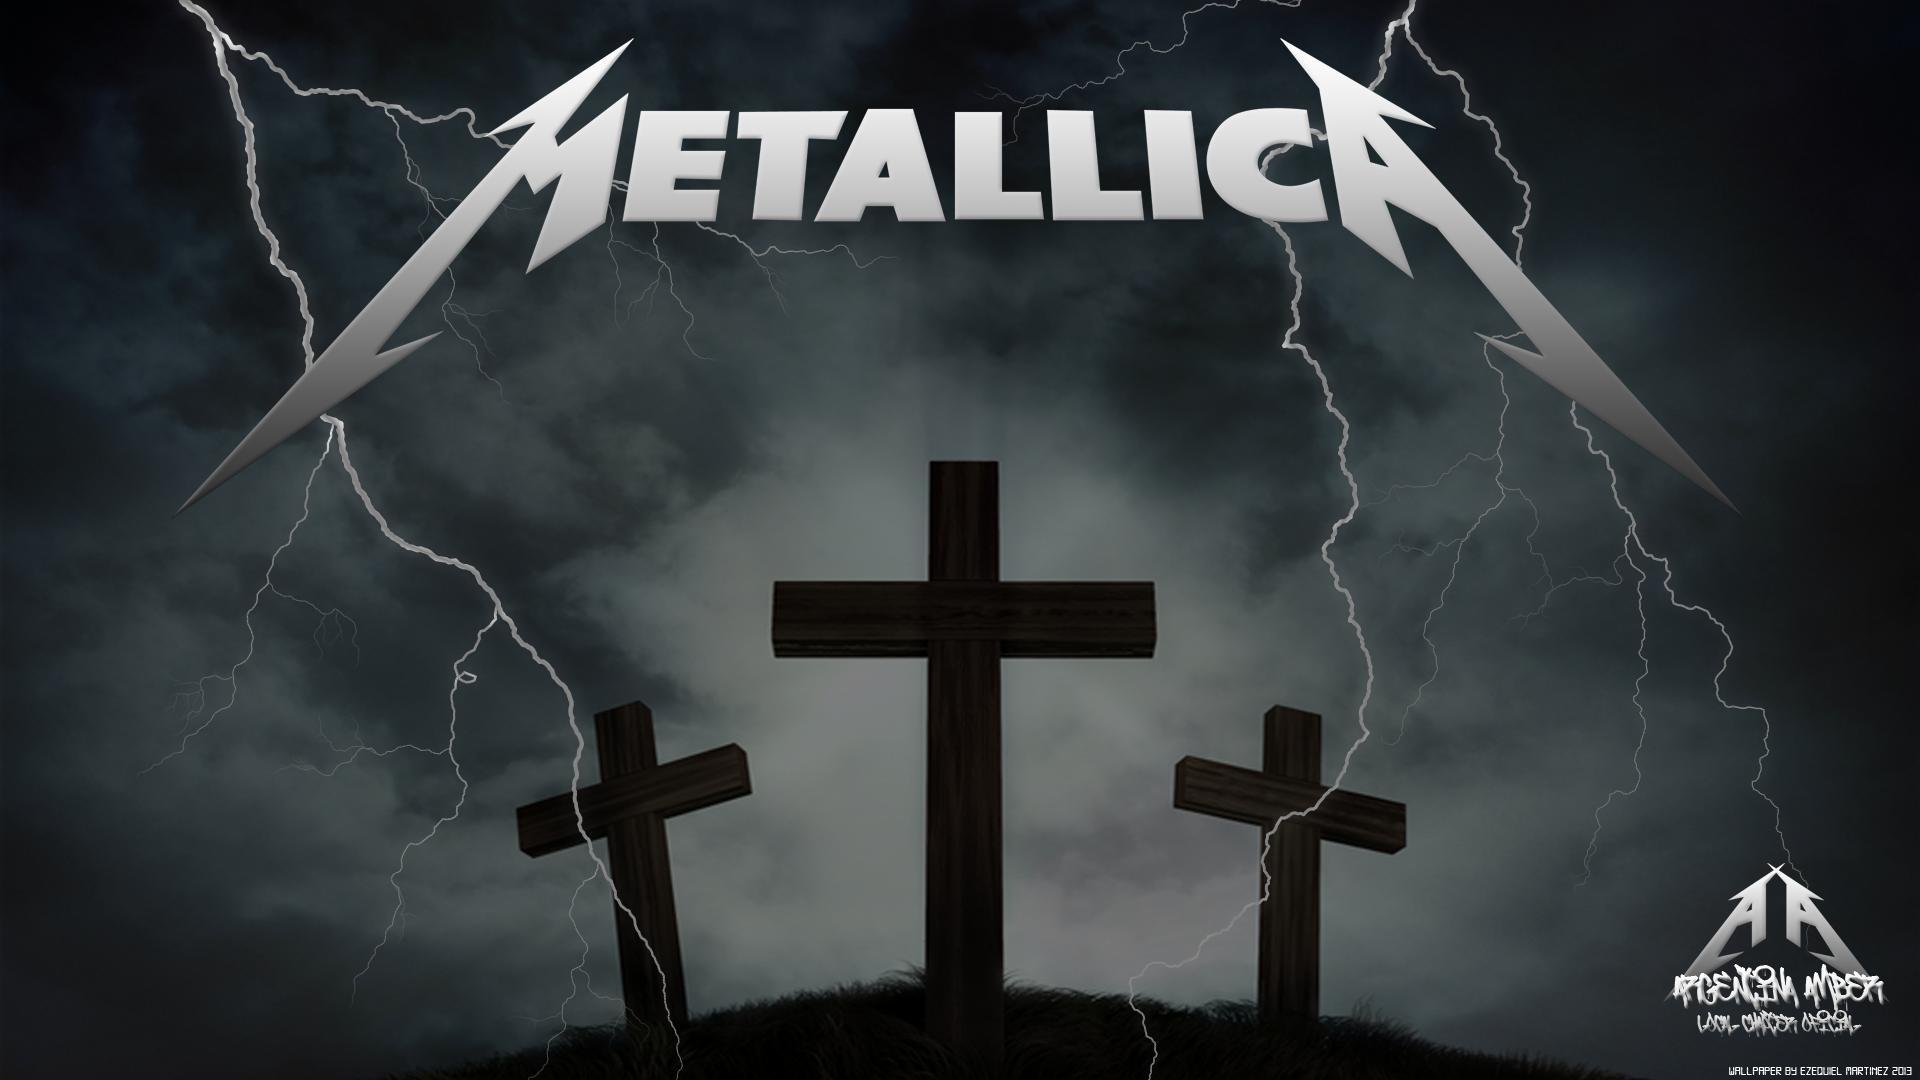 Metallica Wallpapers Desktop Background For Desktop Wallpaper 1920 x 1080  px 623.08 KB master of puppets